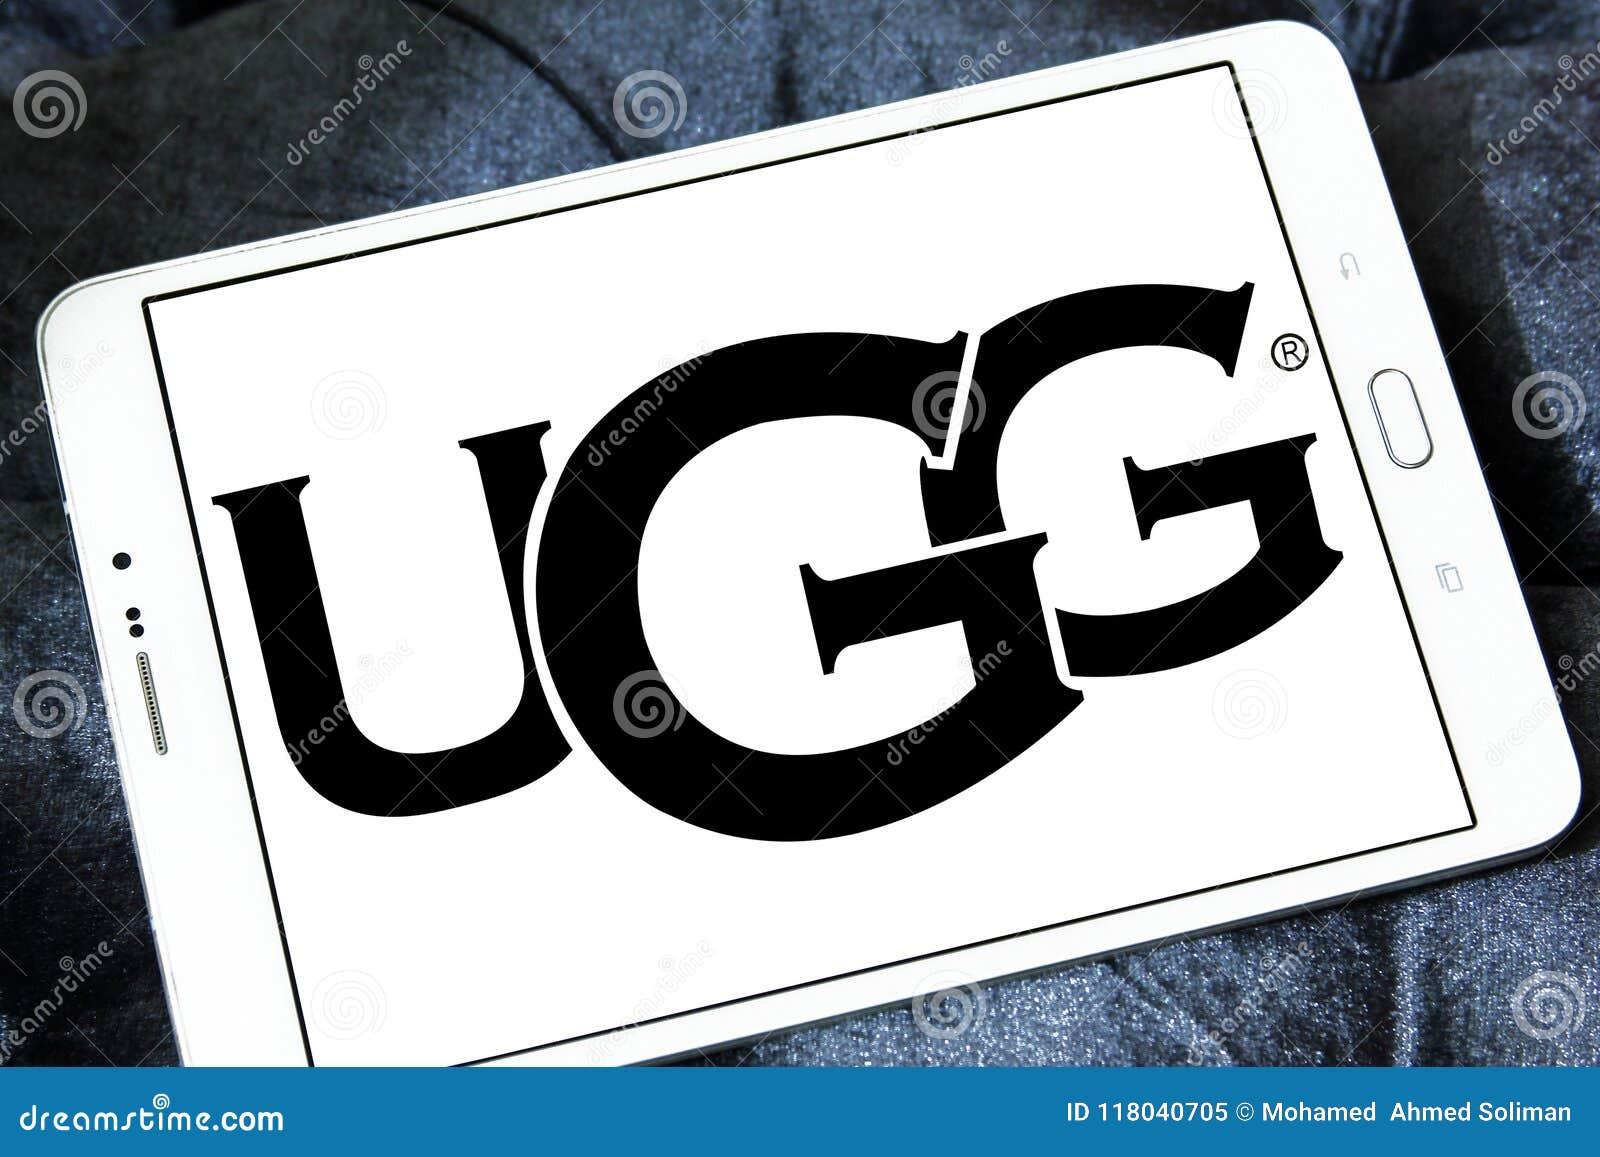 035a42fdda6 Логотип бренда обуви UGG редакционное изображение. изображение ...